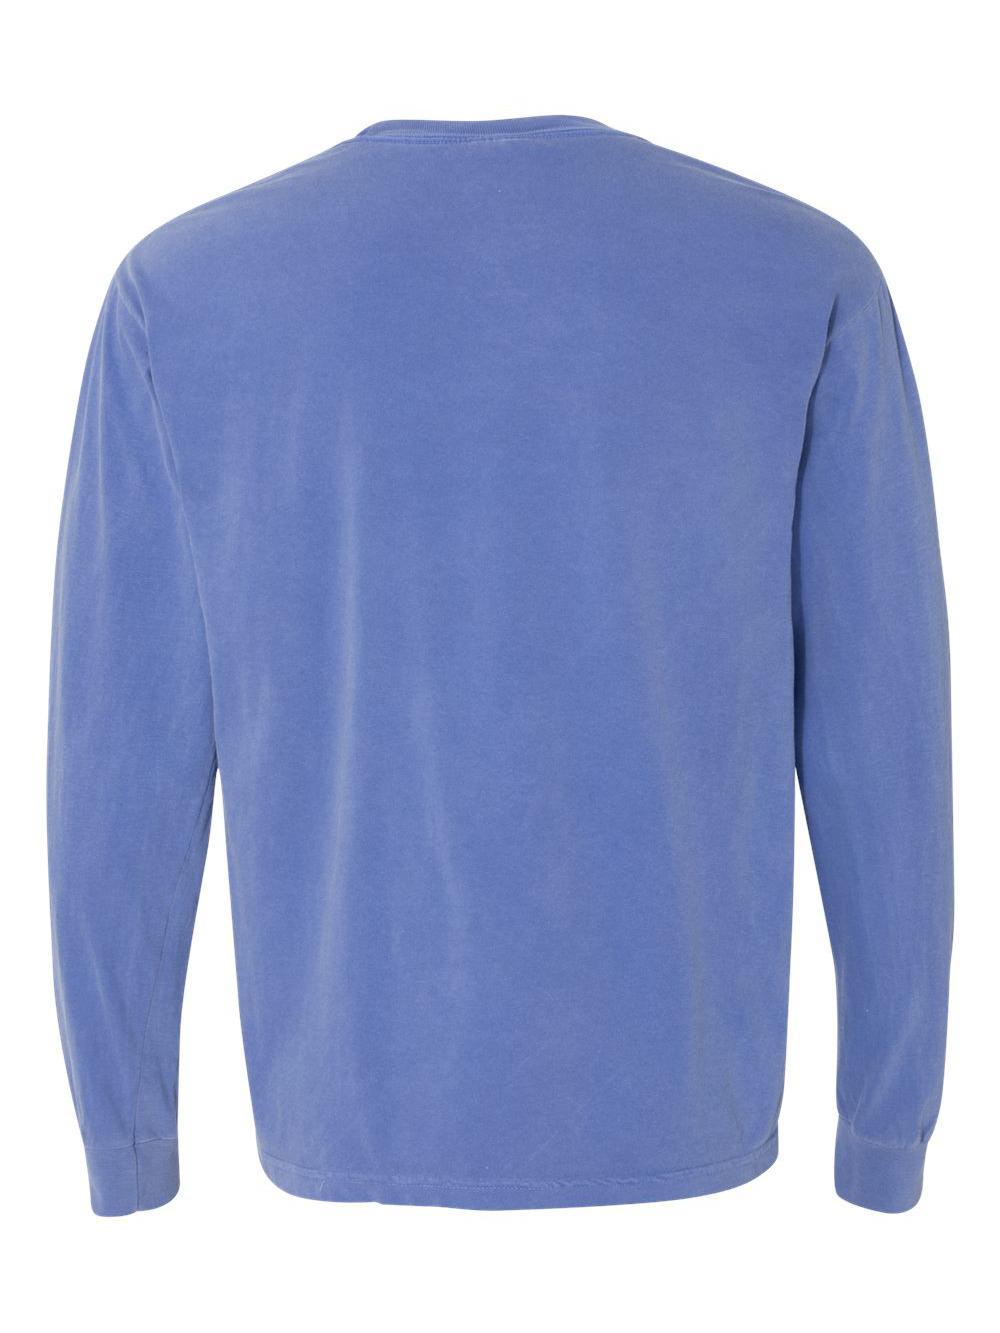 Comfort-Colors-Garment-Dyed-Heavyweight-Ringspun-Long-Sleeve-T-Shirt-6014 thumbnail 34